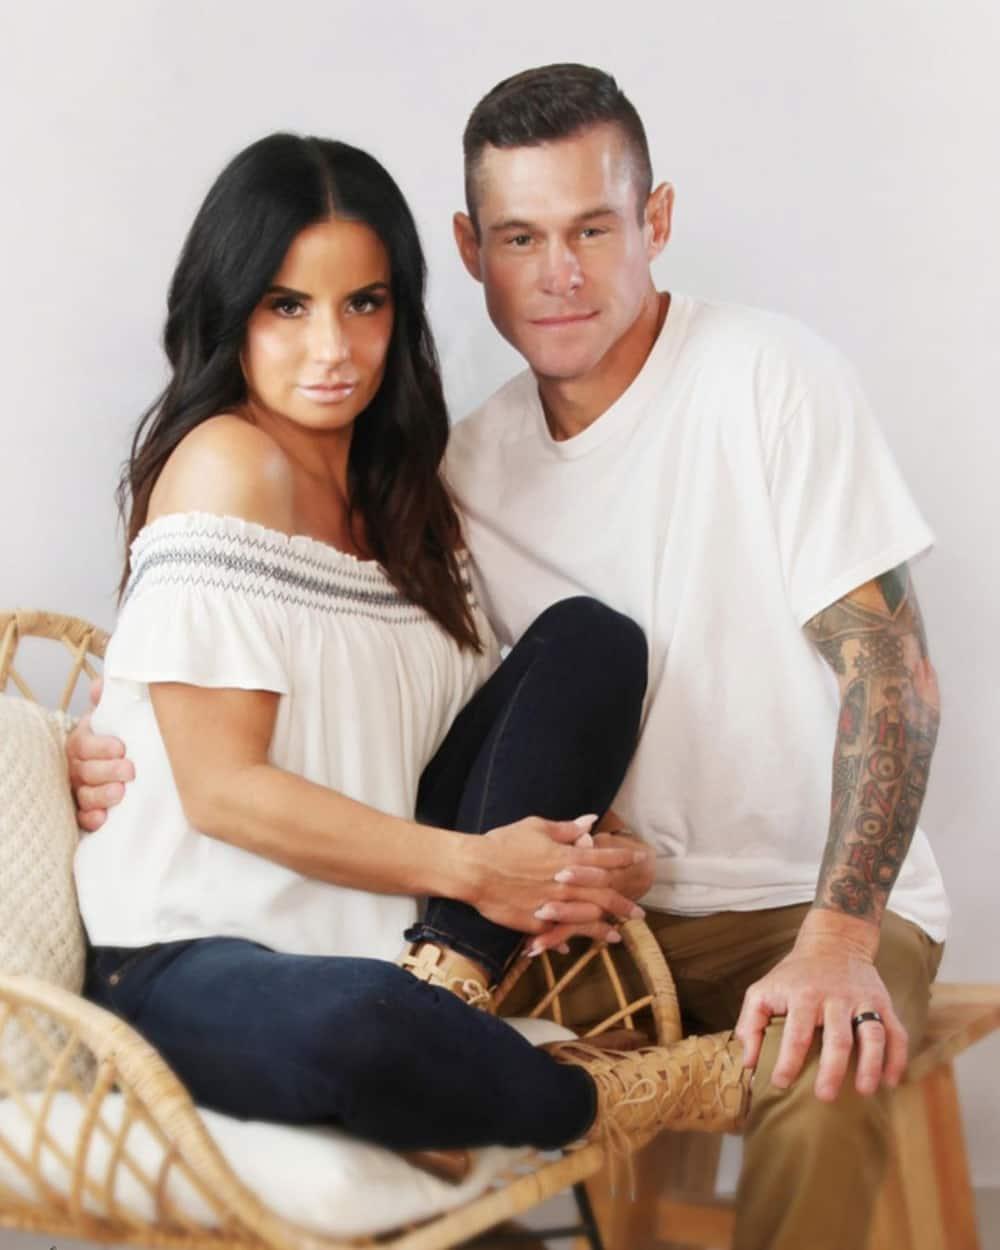 Marissa Deegan spouse